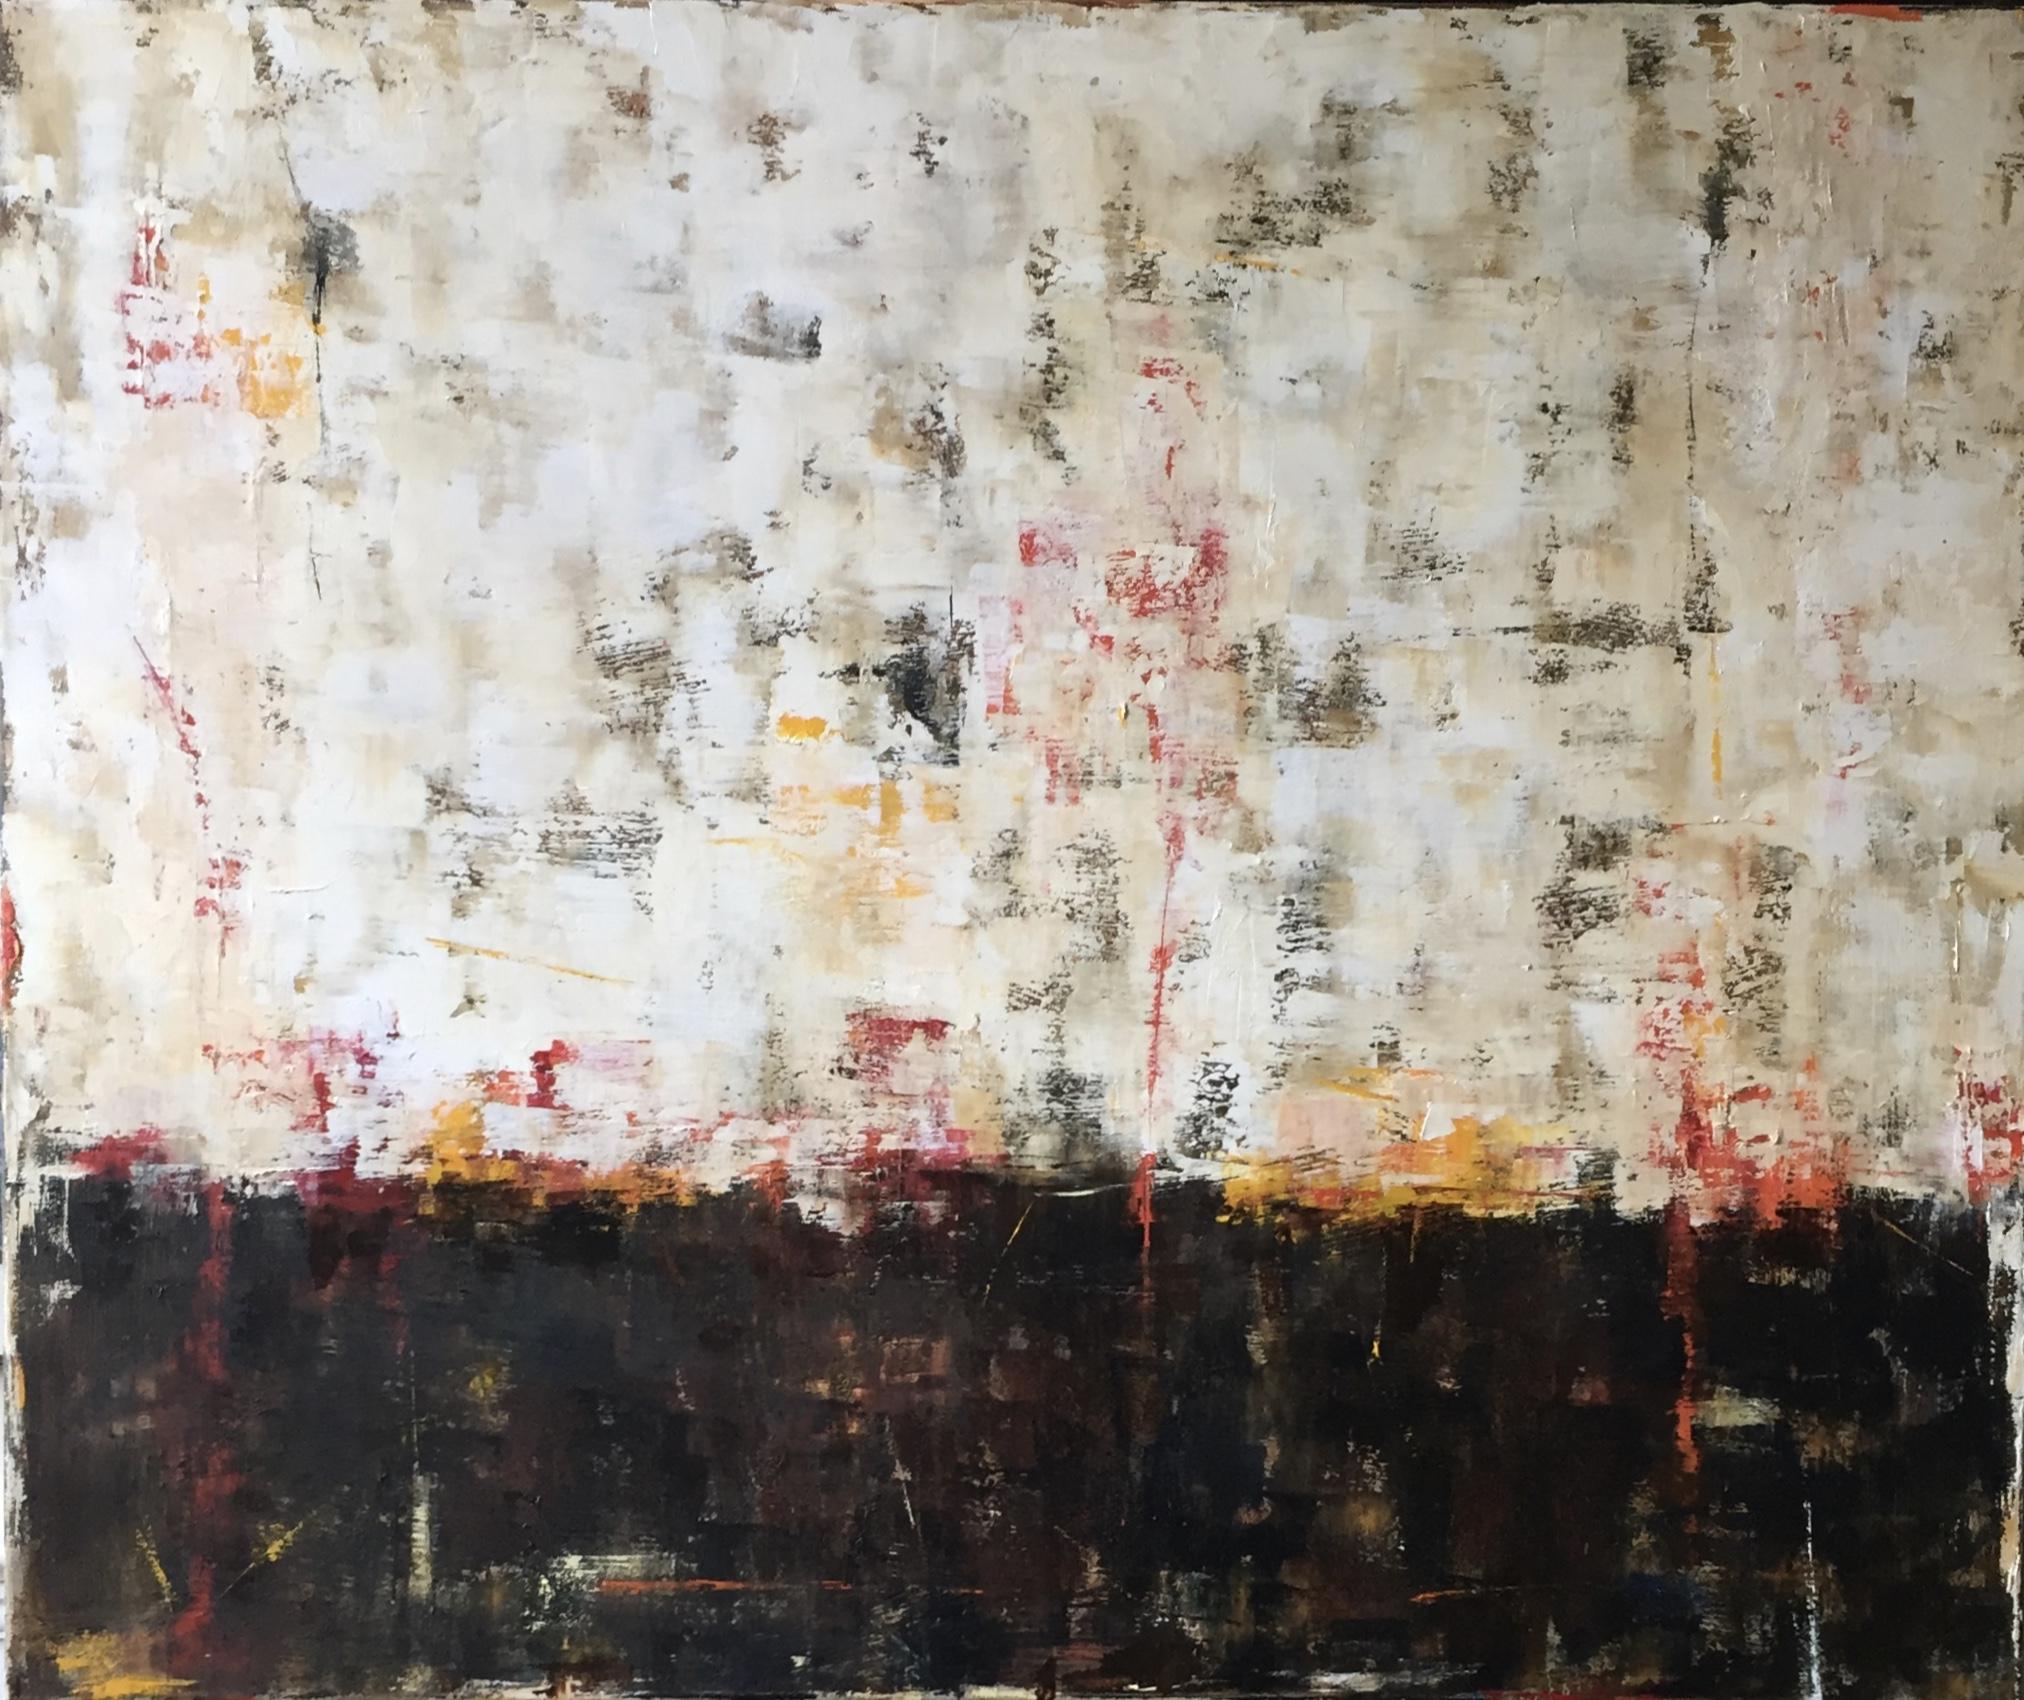 Badlands, Oil on Canvas, 36x30